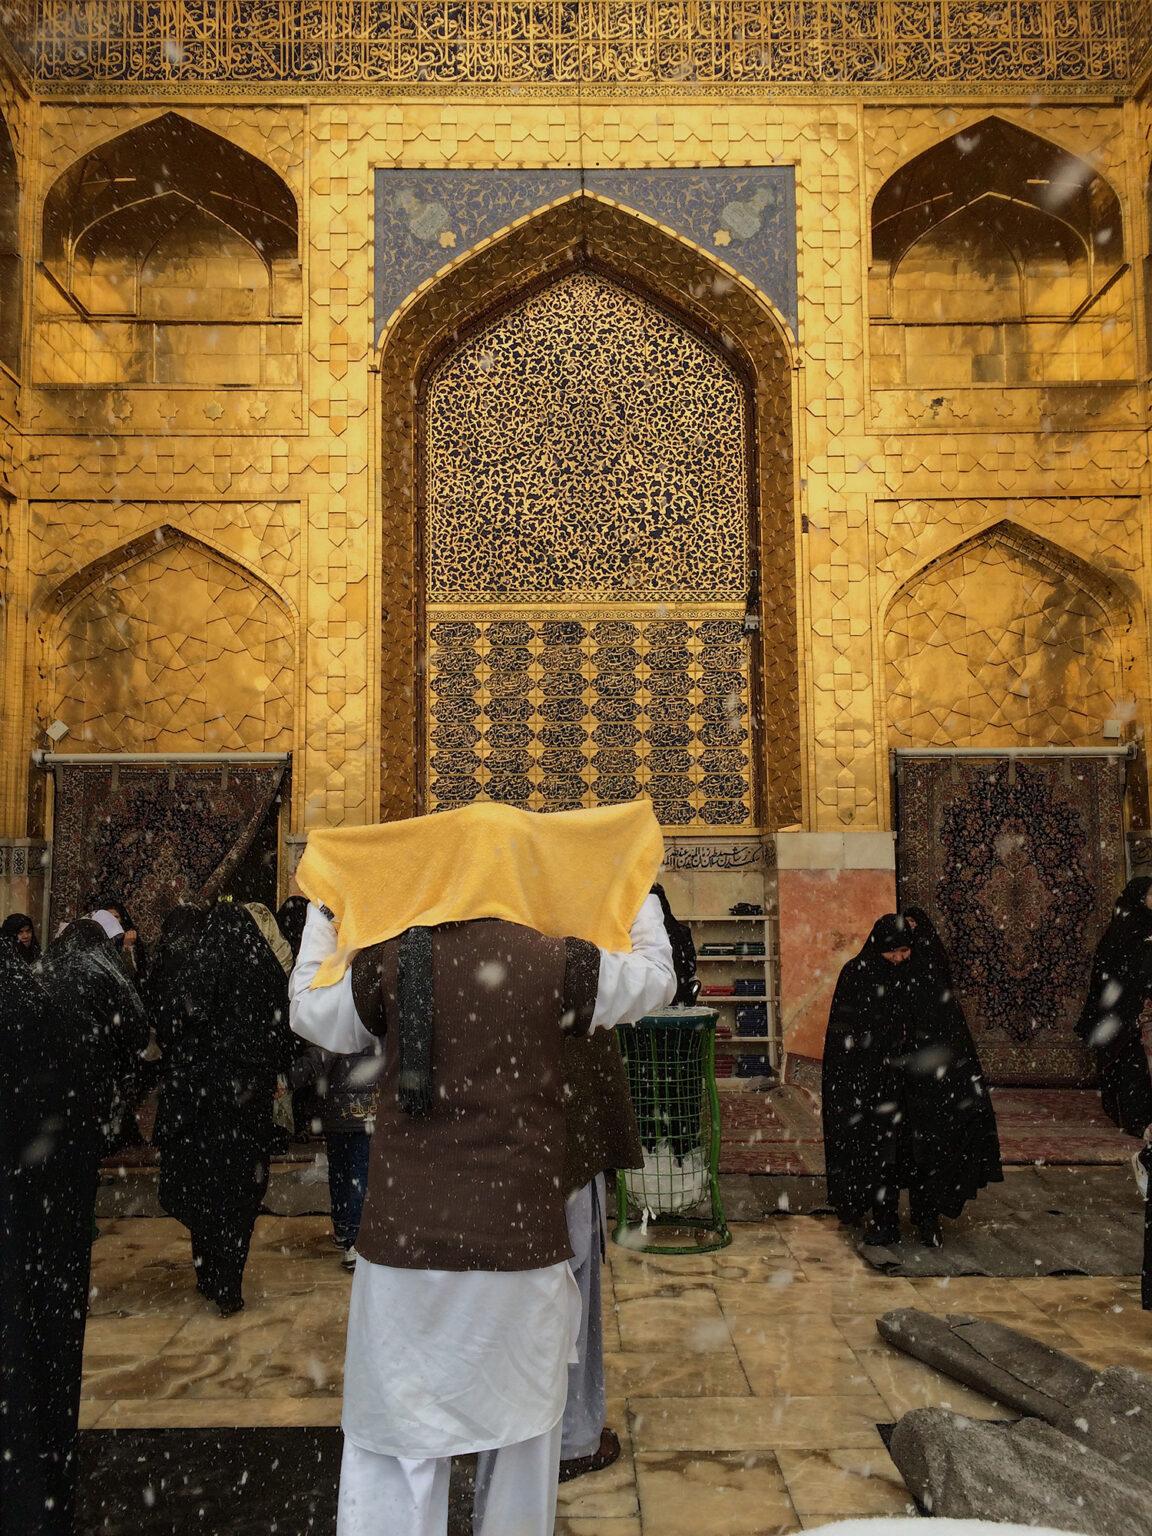 Holy Shrine Of Imam Reza, Mashhad, Iran, 2016.